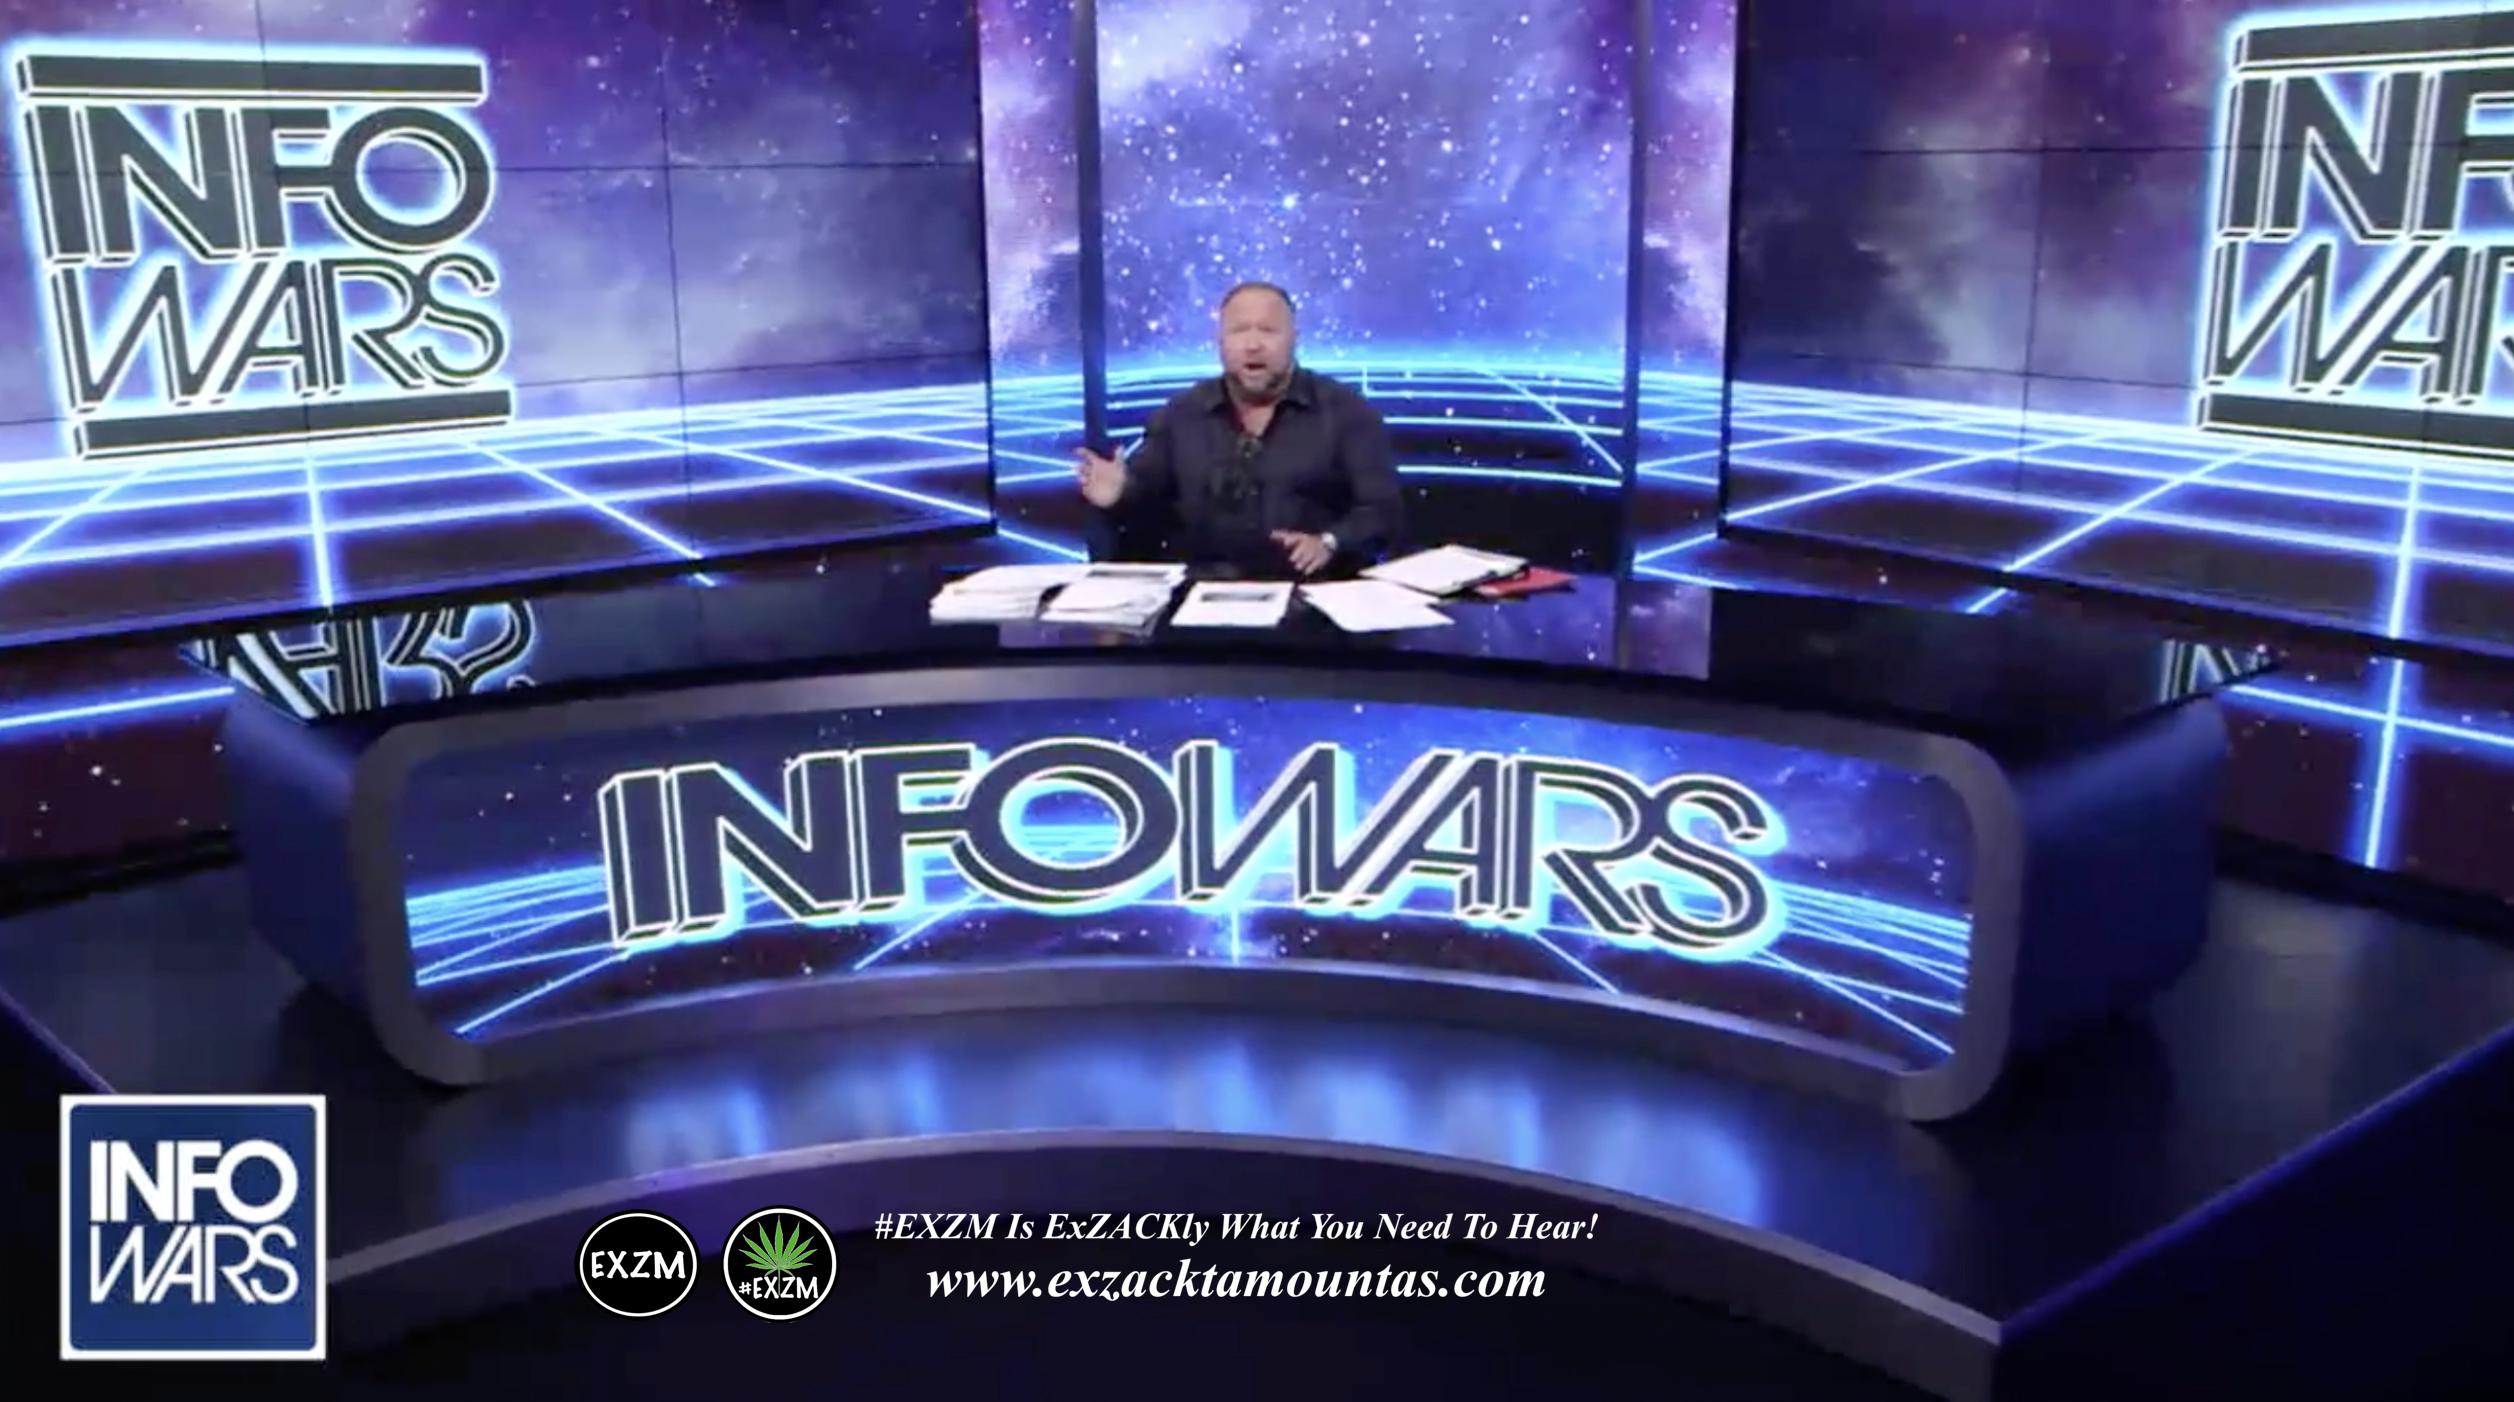 Alex Jones Live Infowars Studio EXZM Zack Mount March 26th 2021 copy